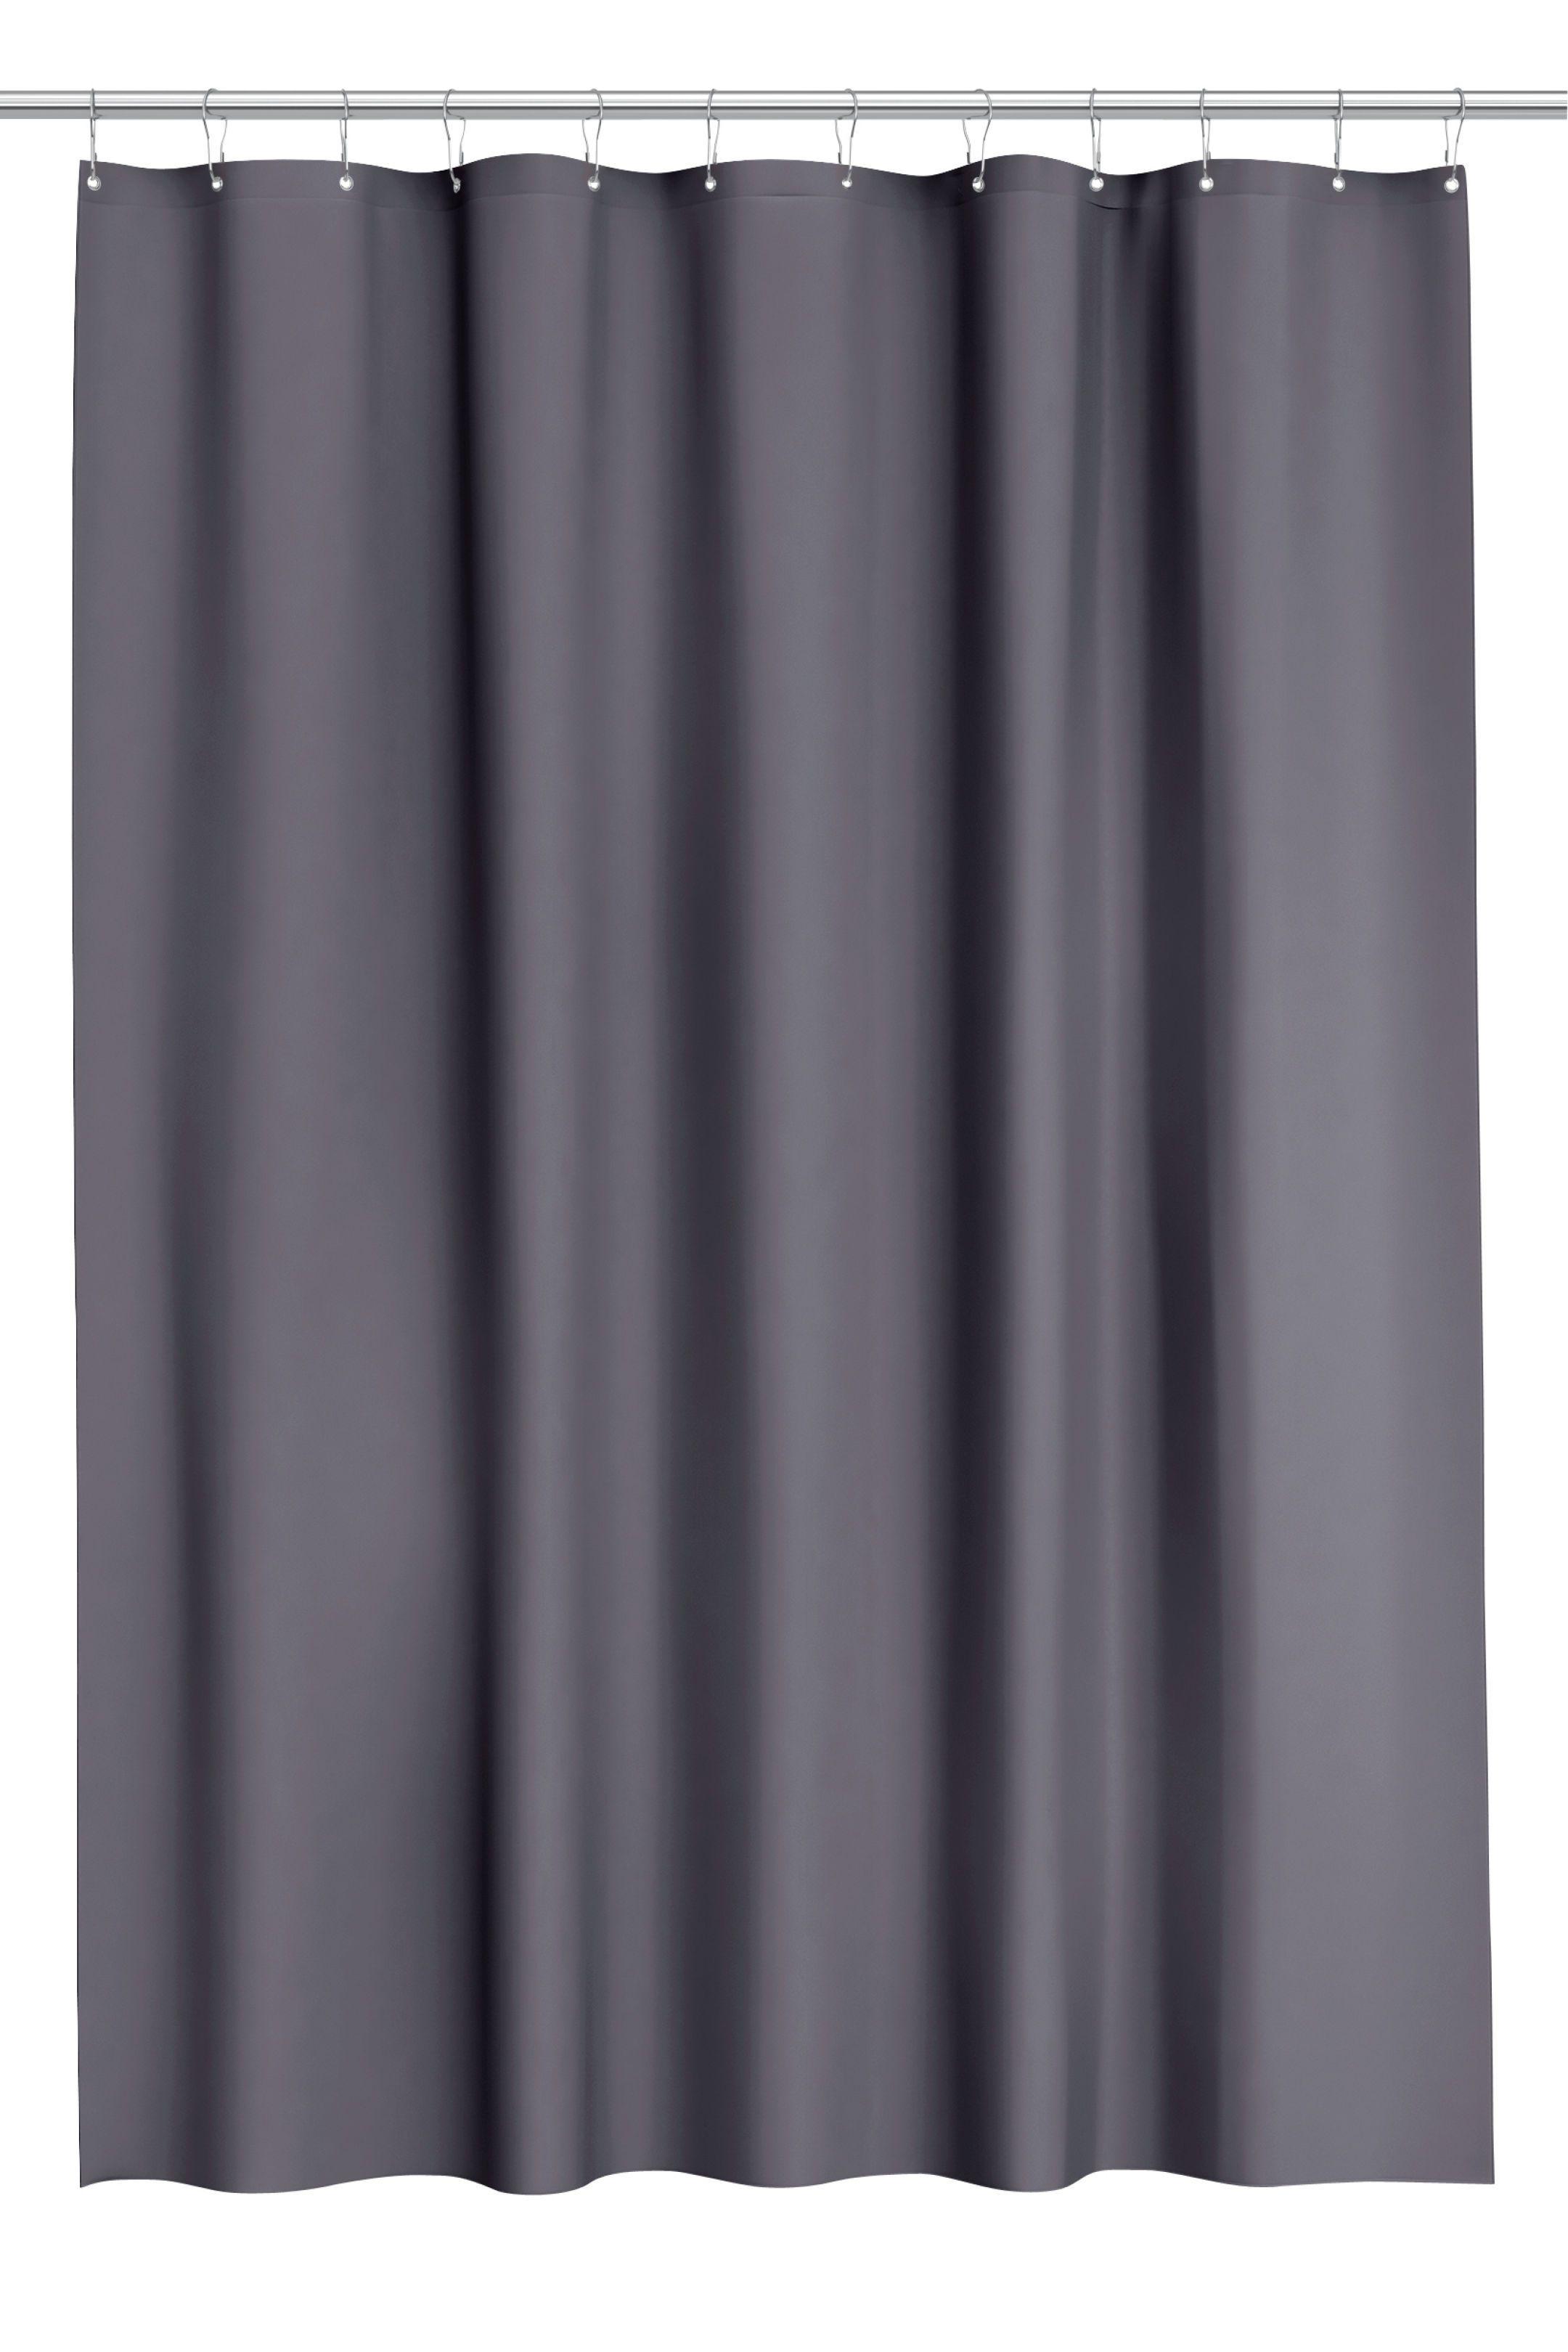 Shower Curtain Dark Curtains Gray Shower Curtains Curtains